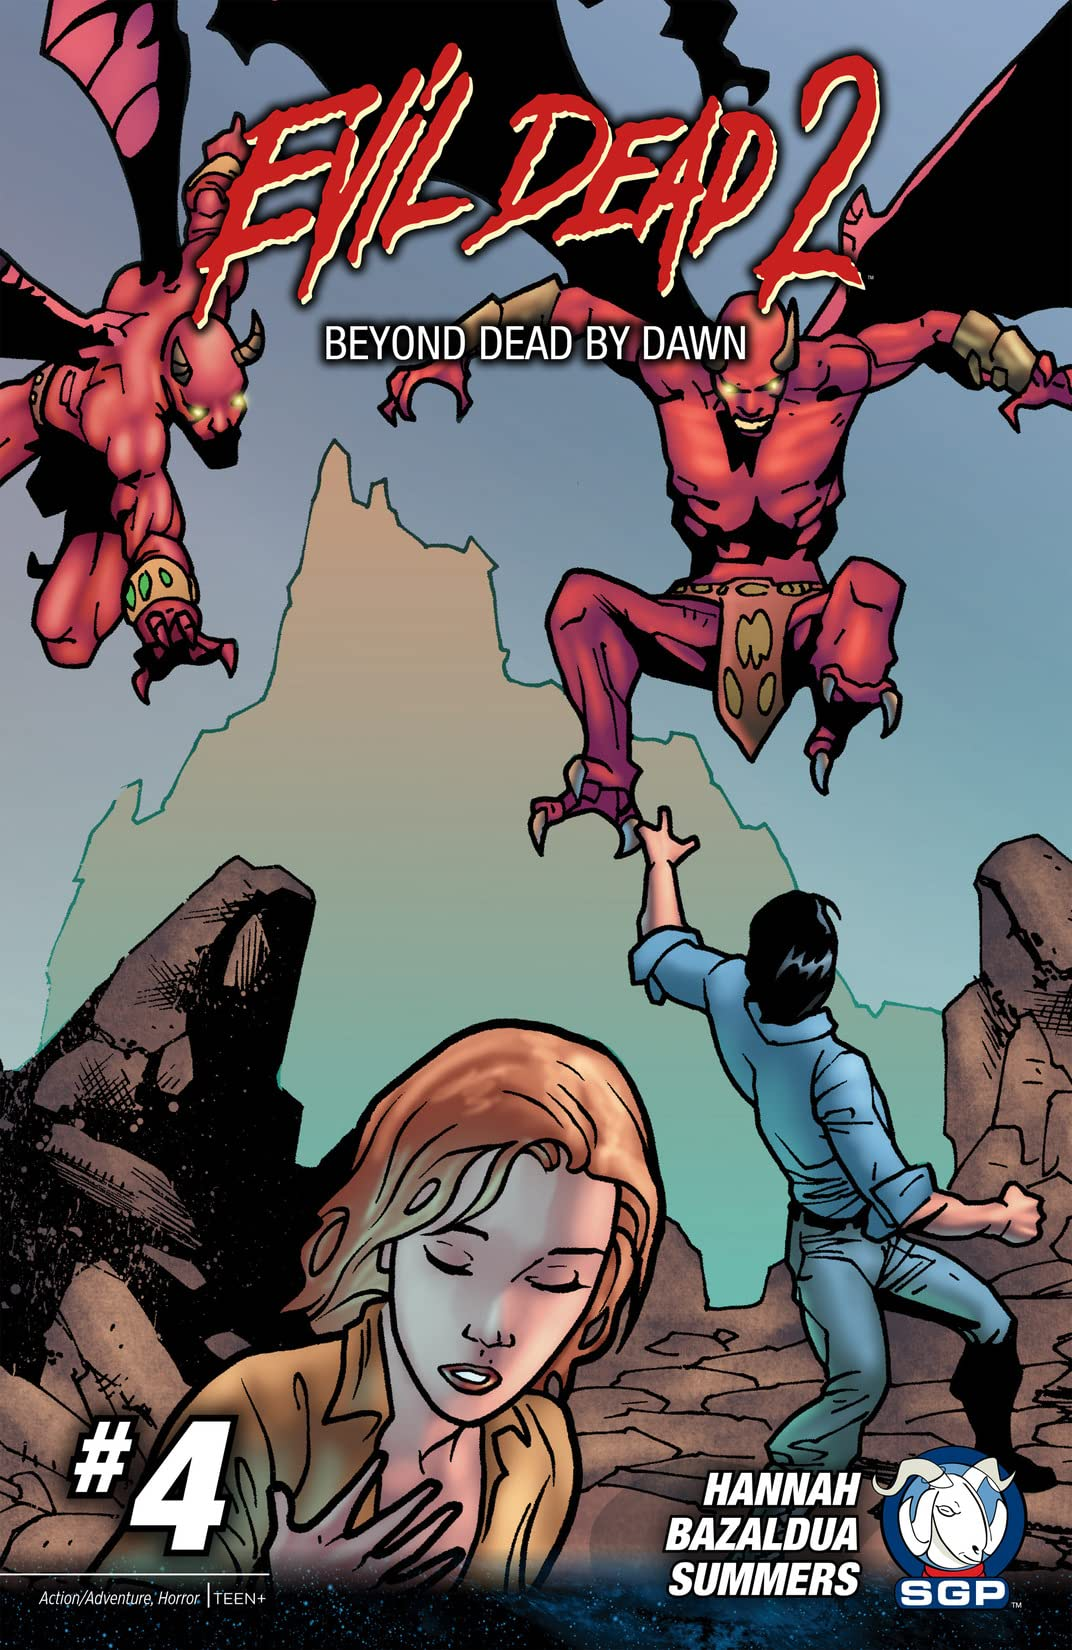 Evil Dead 2 #4